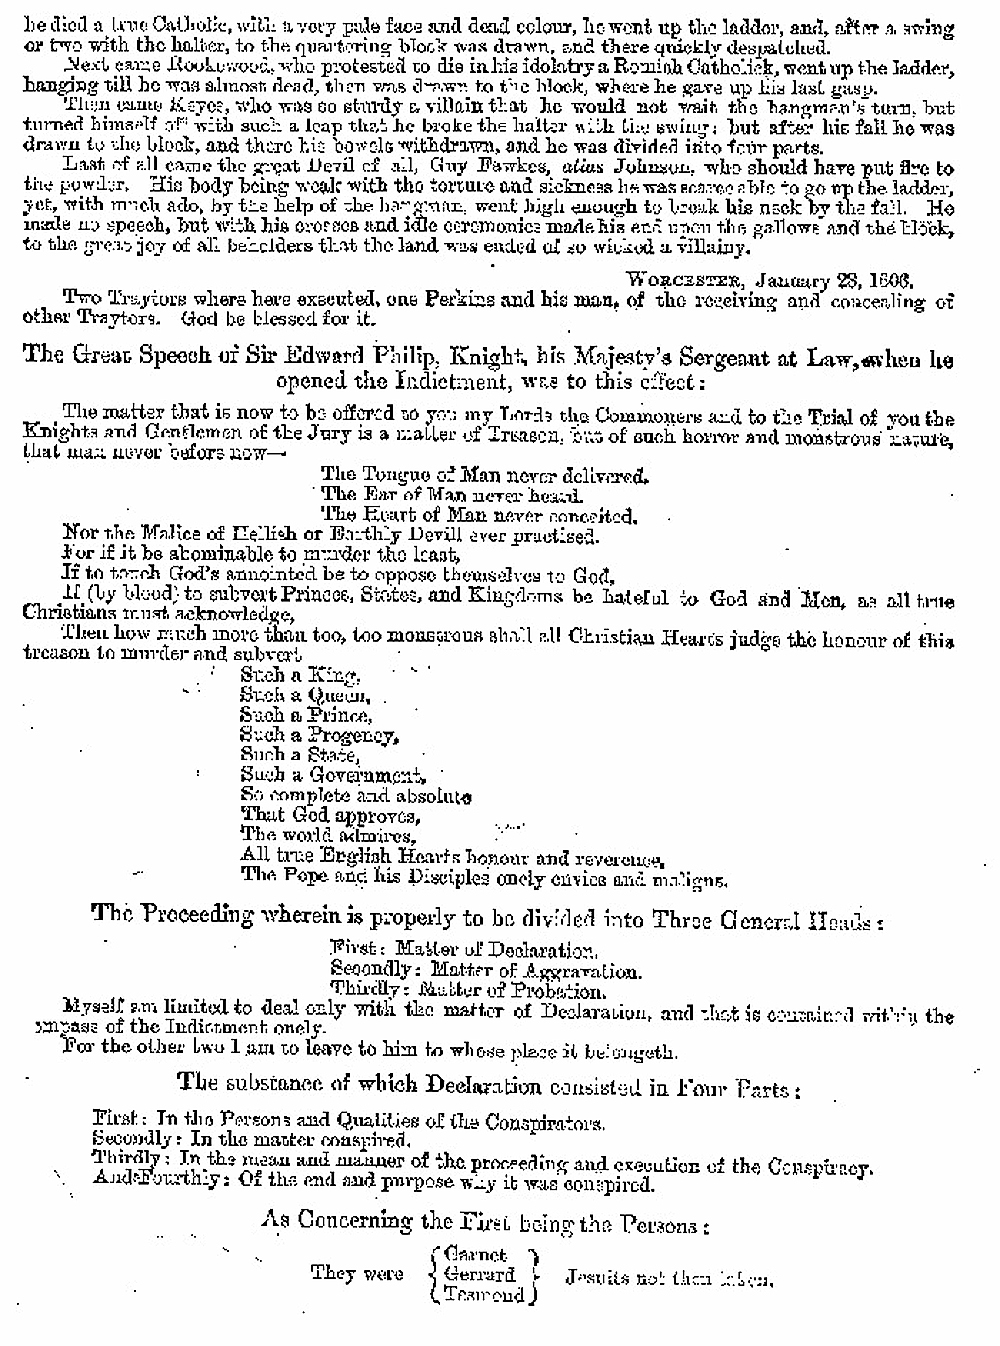 The Gunpowder Plot And Guy Fawkes | Lewes Bonfire Night Celebrations